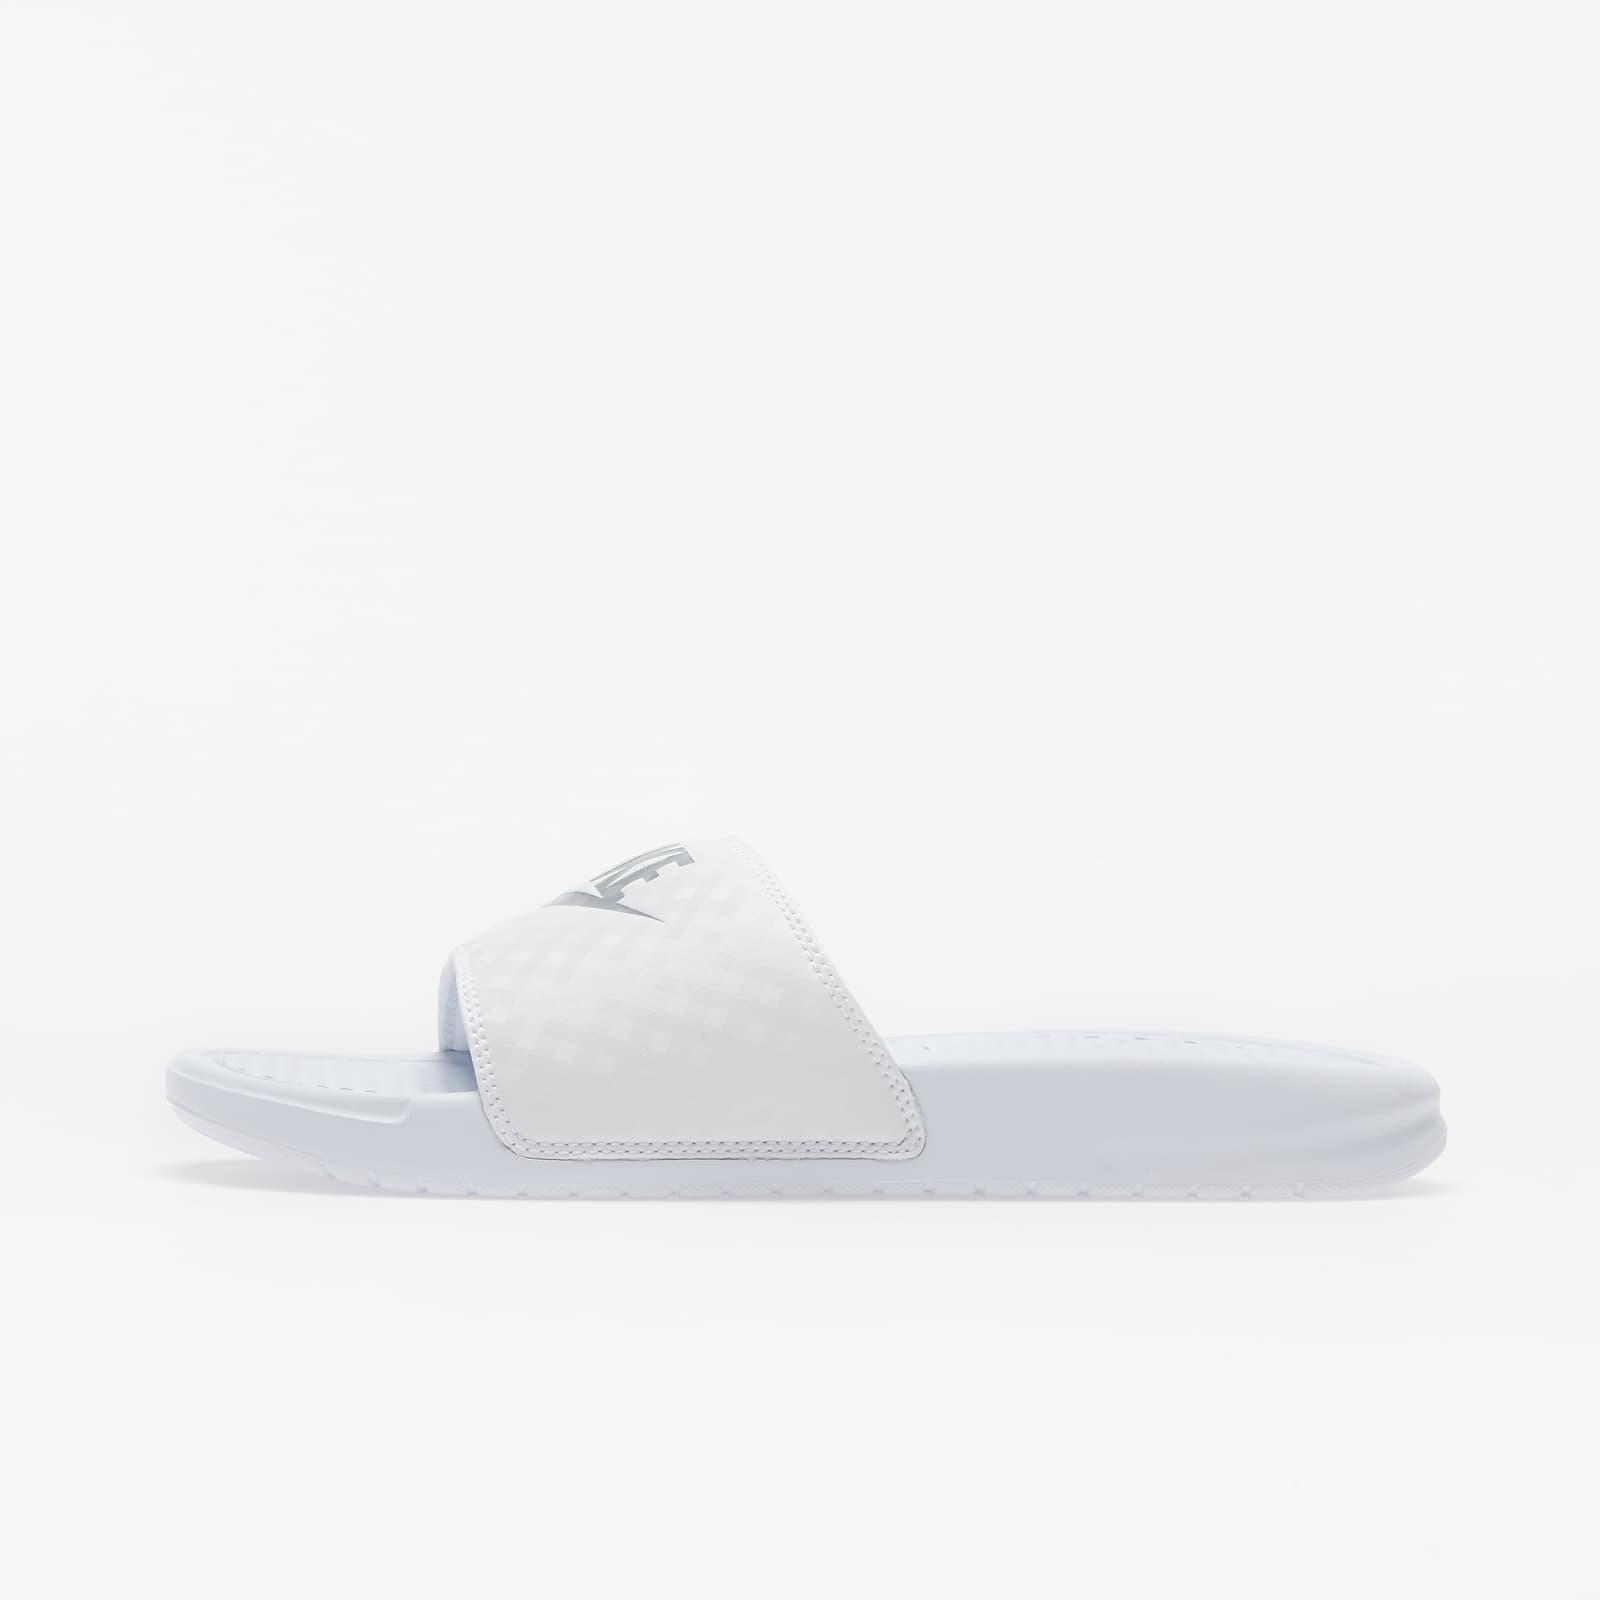 Nike Wmns Benassi Jdi White/ Metallic Silver 343881-102